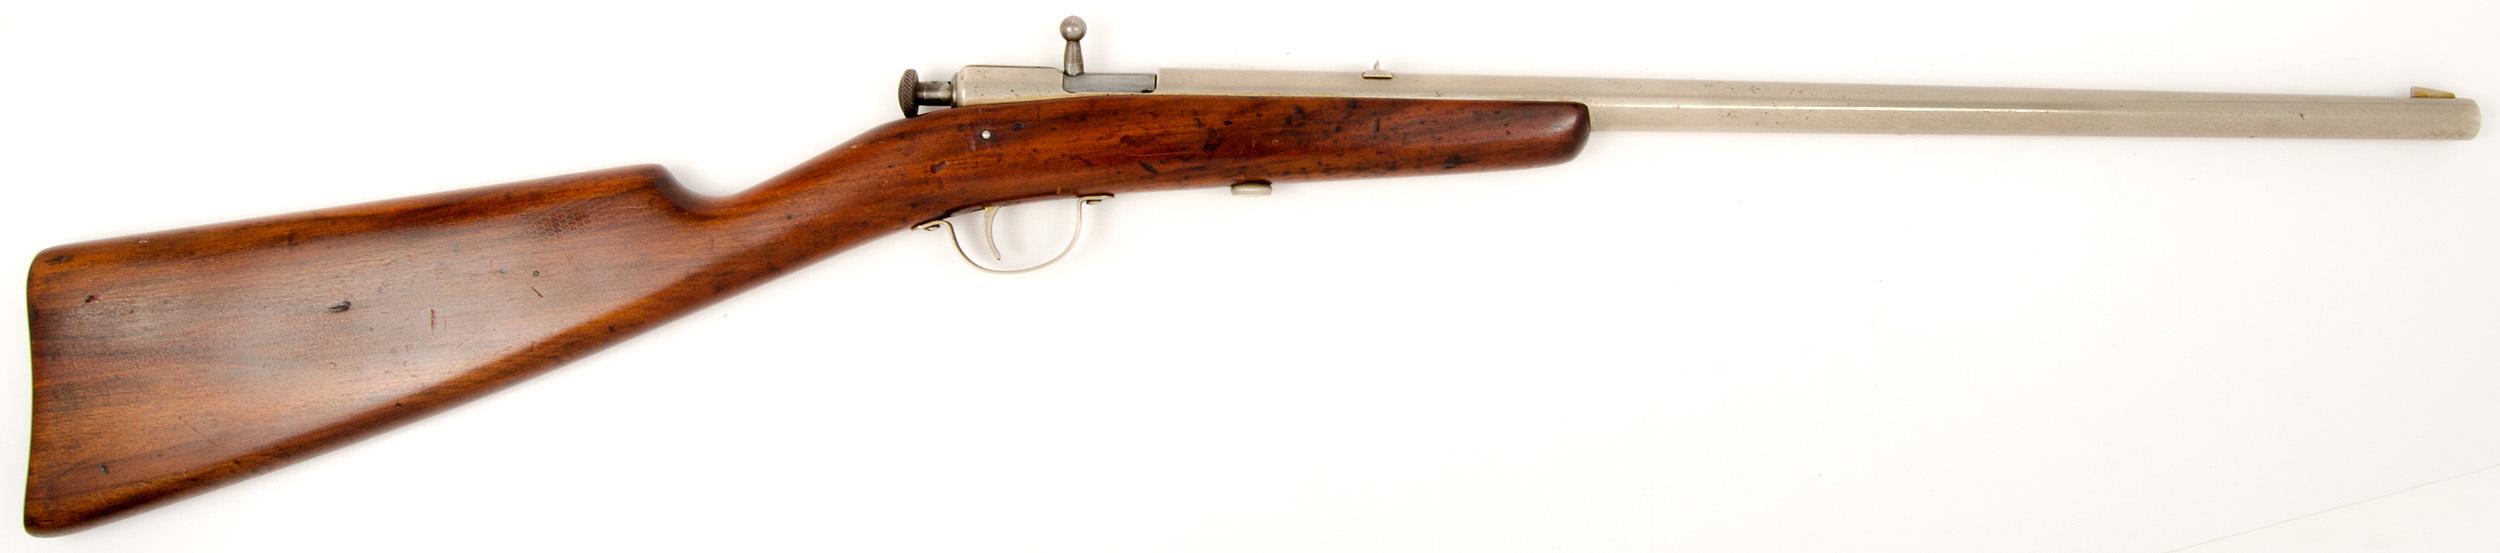 Winchester Model 58